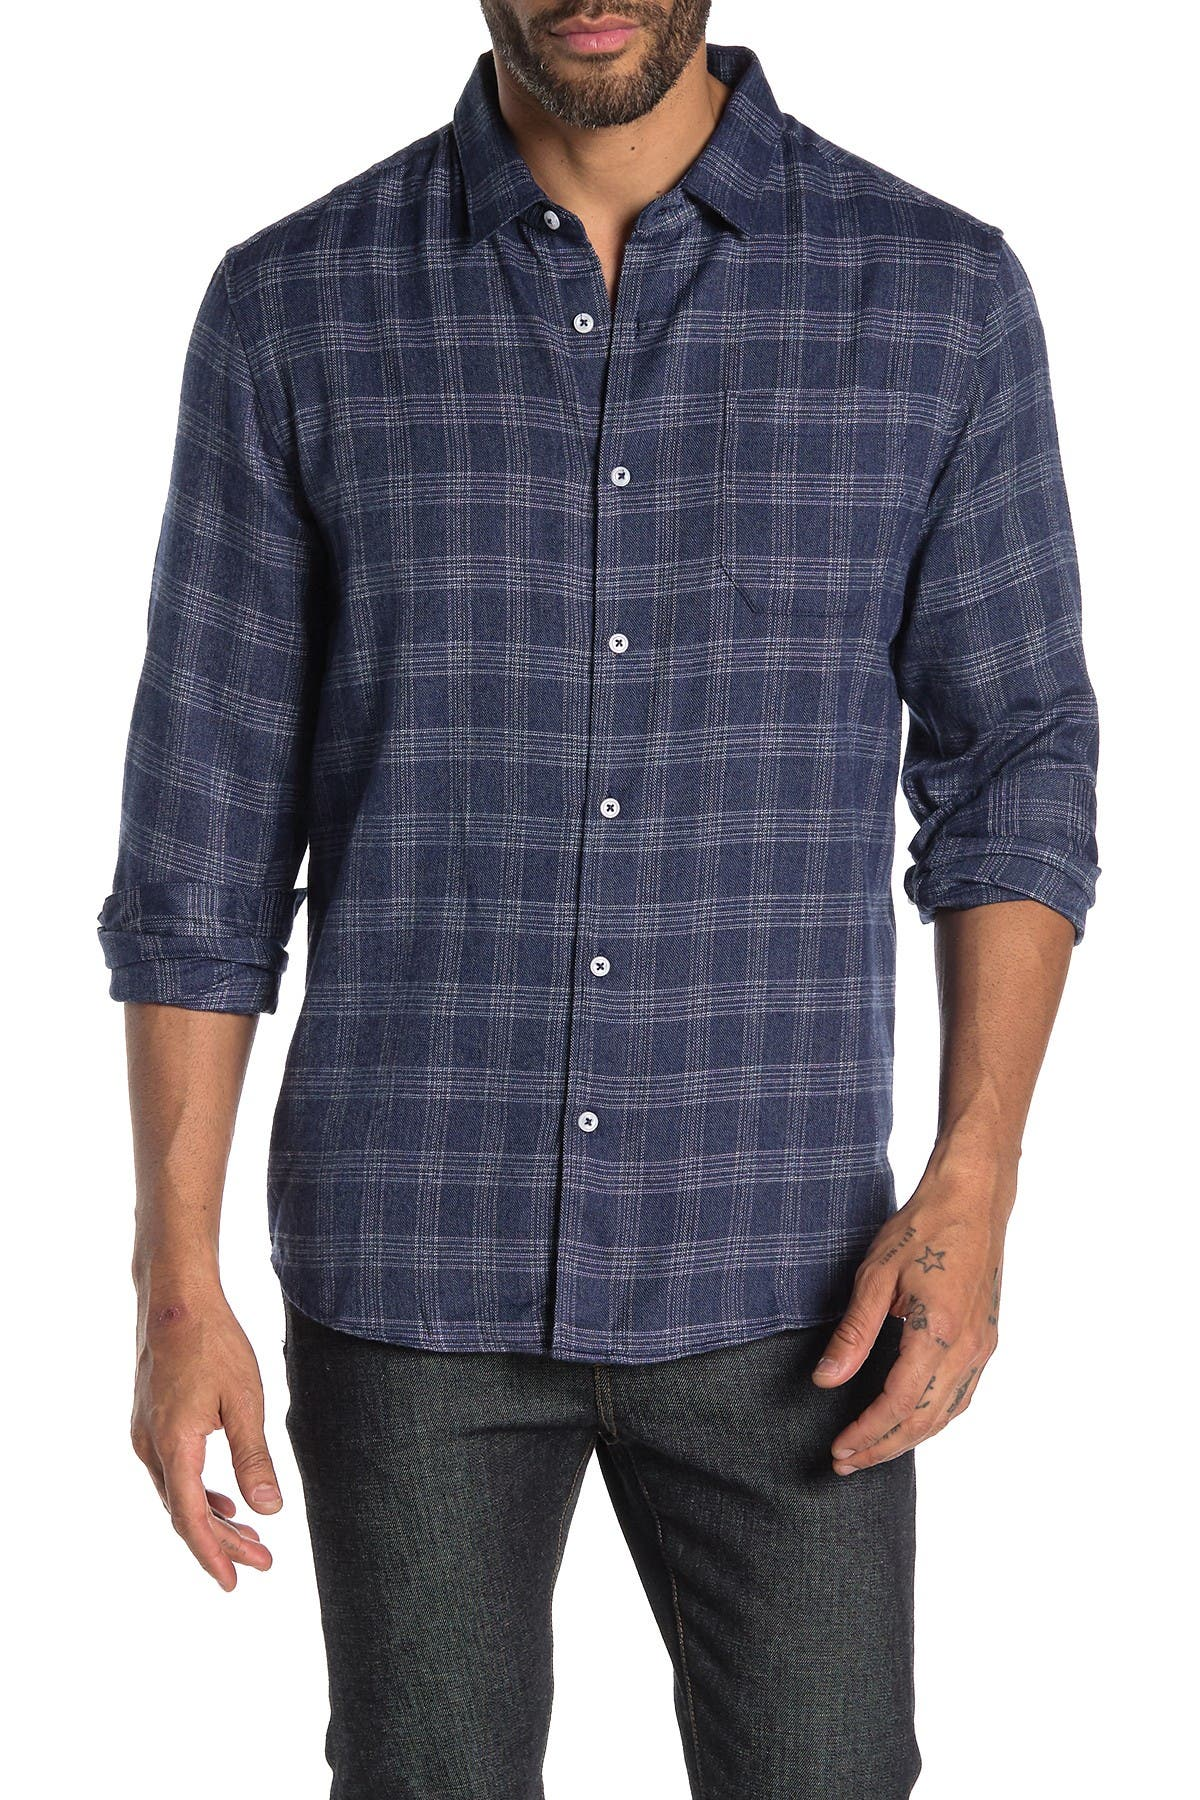 Image of 7 Diamonds Back To Me Plaid Flannel Shirt